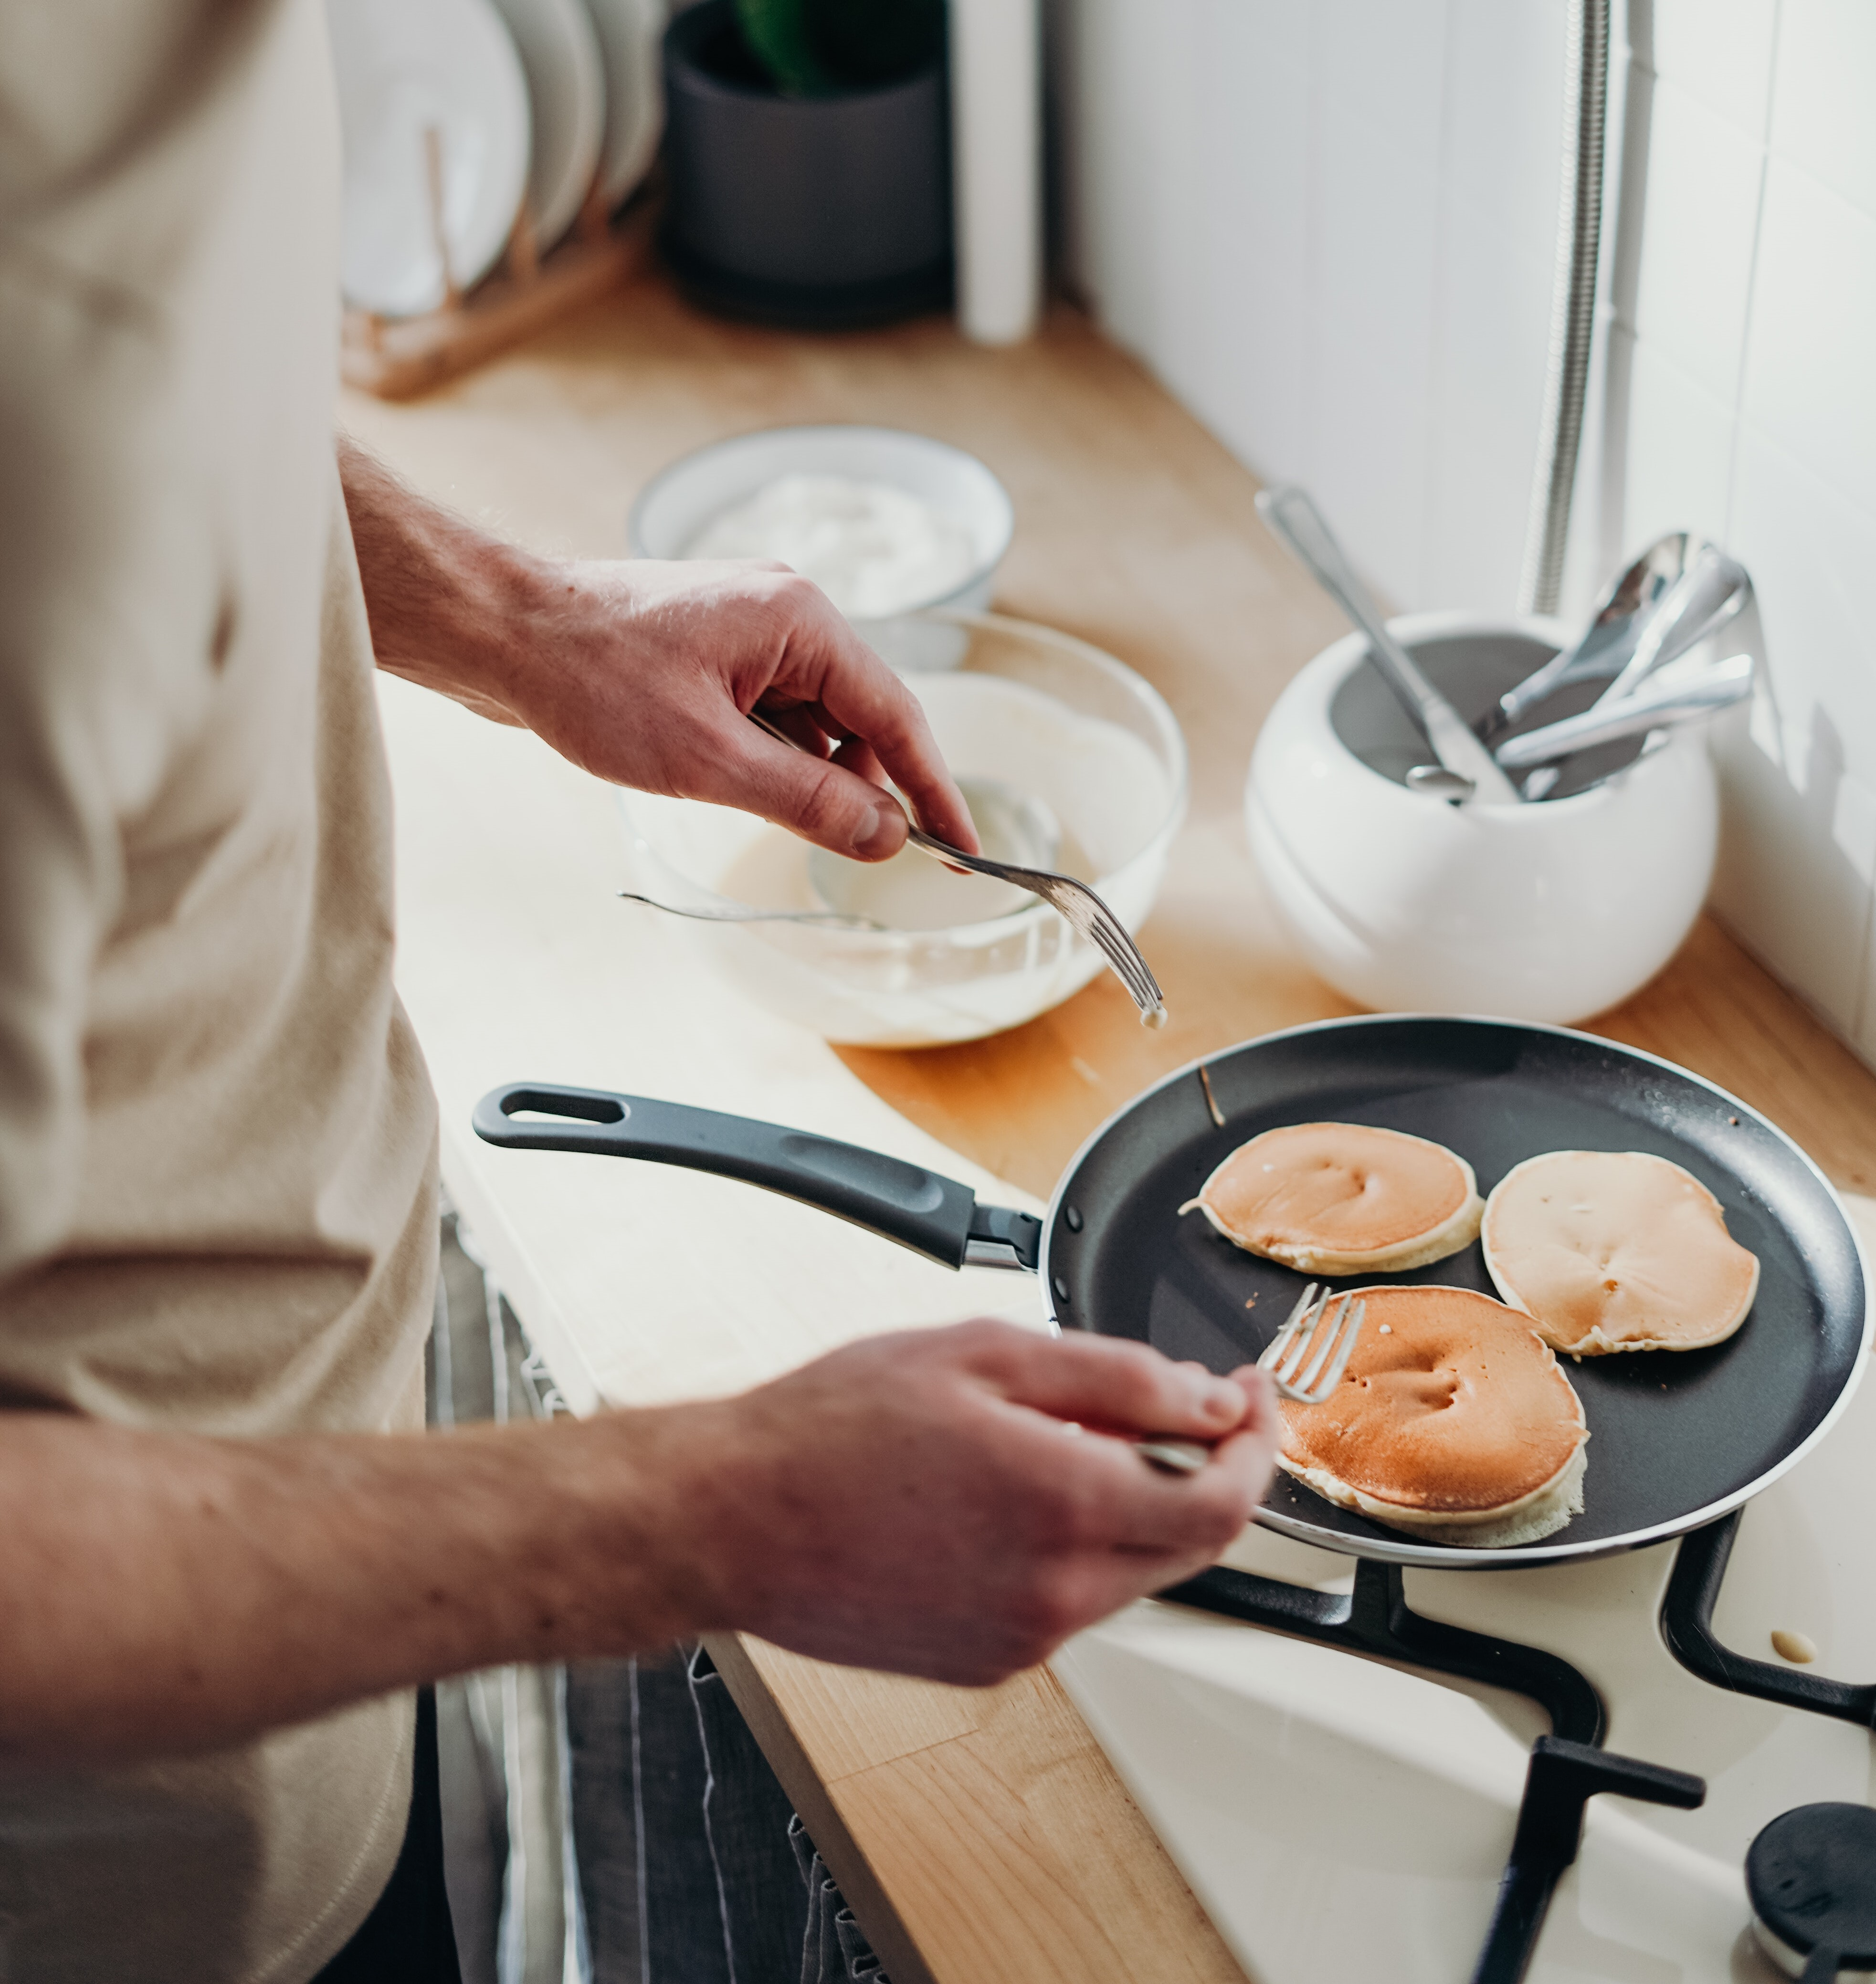 man making pancakes on the stove